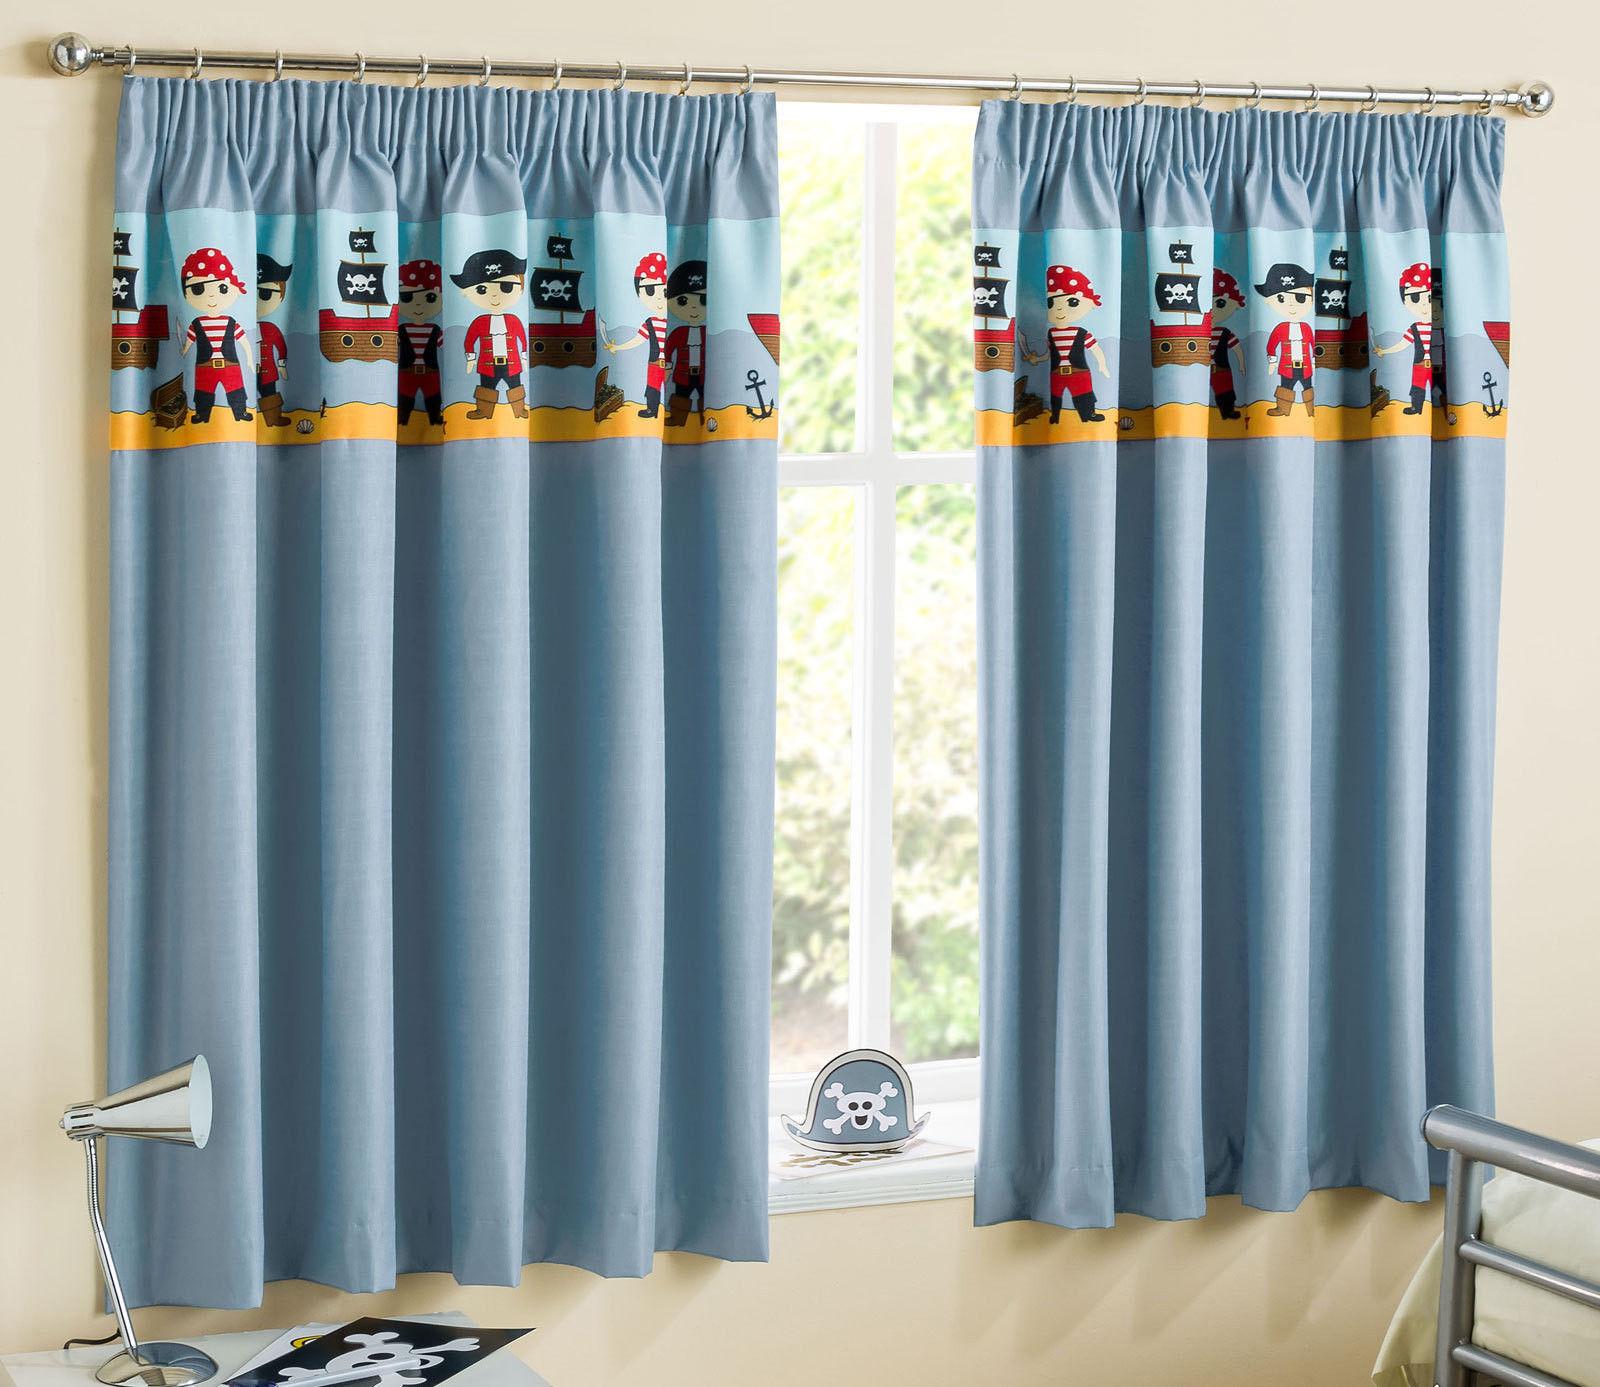 Children 39 s pirates curtains light reducing thermal kids - Cortinas store infantiles ...